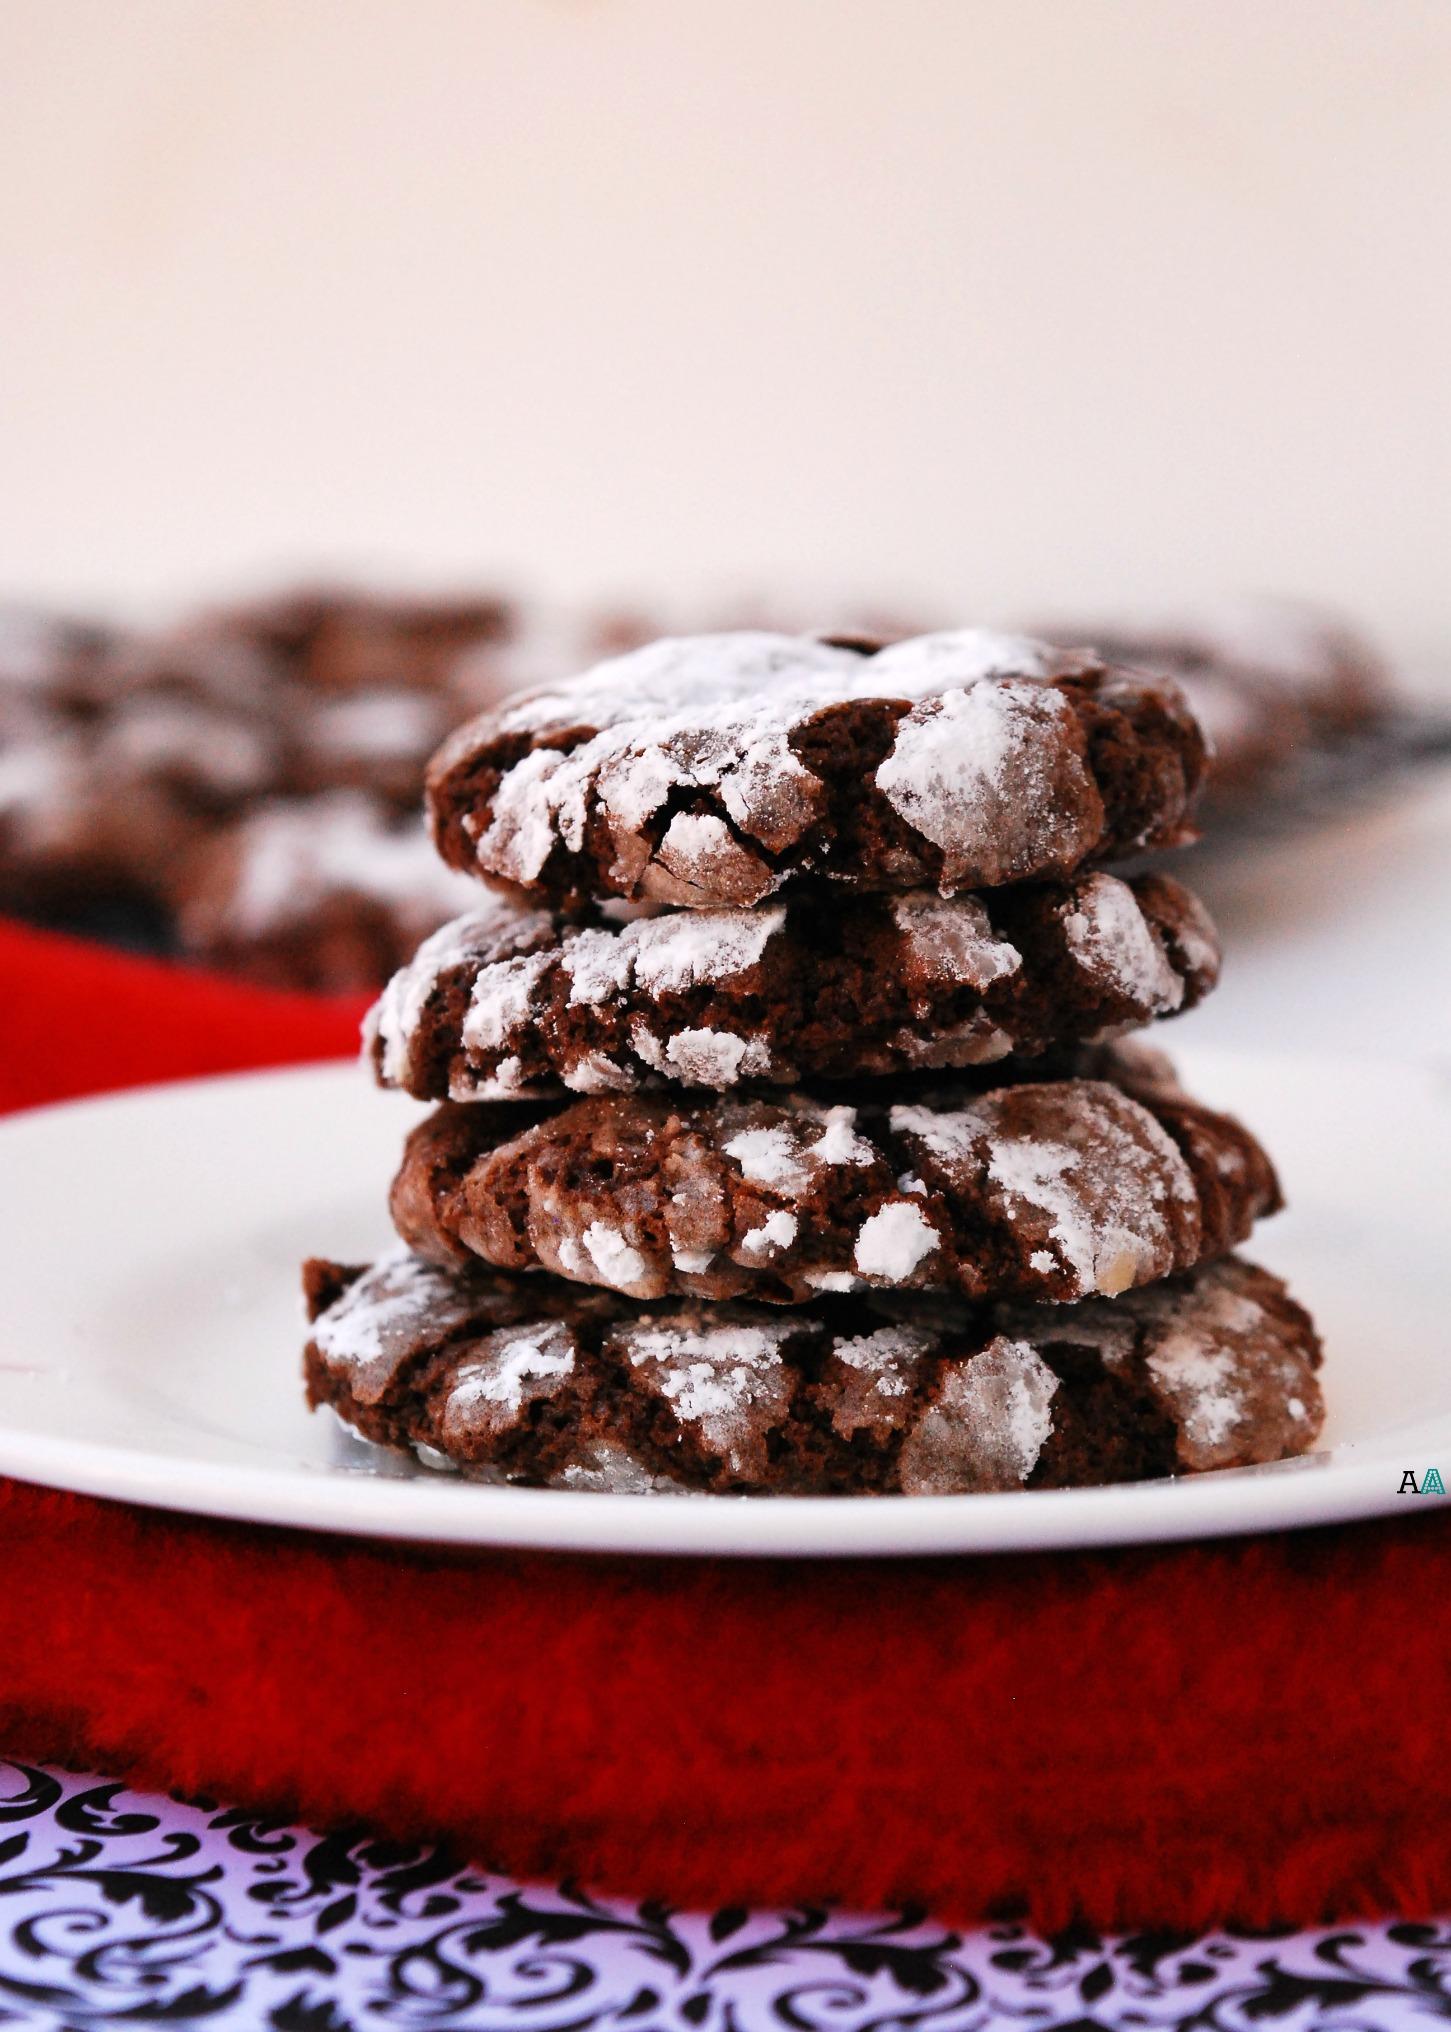 Christmas Chocolate Peppermint Crinkle Cookies Gf Vegan Peanut Tree Nut Free